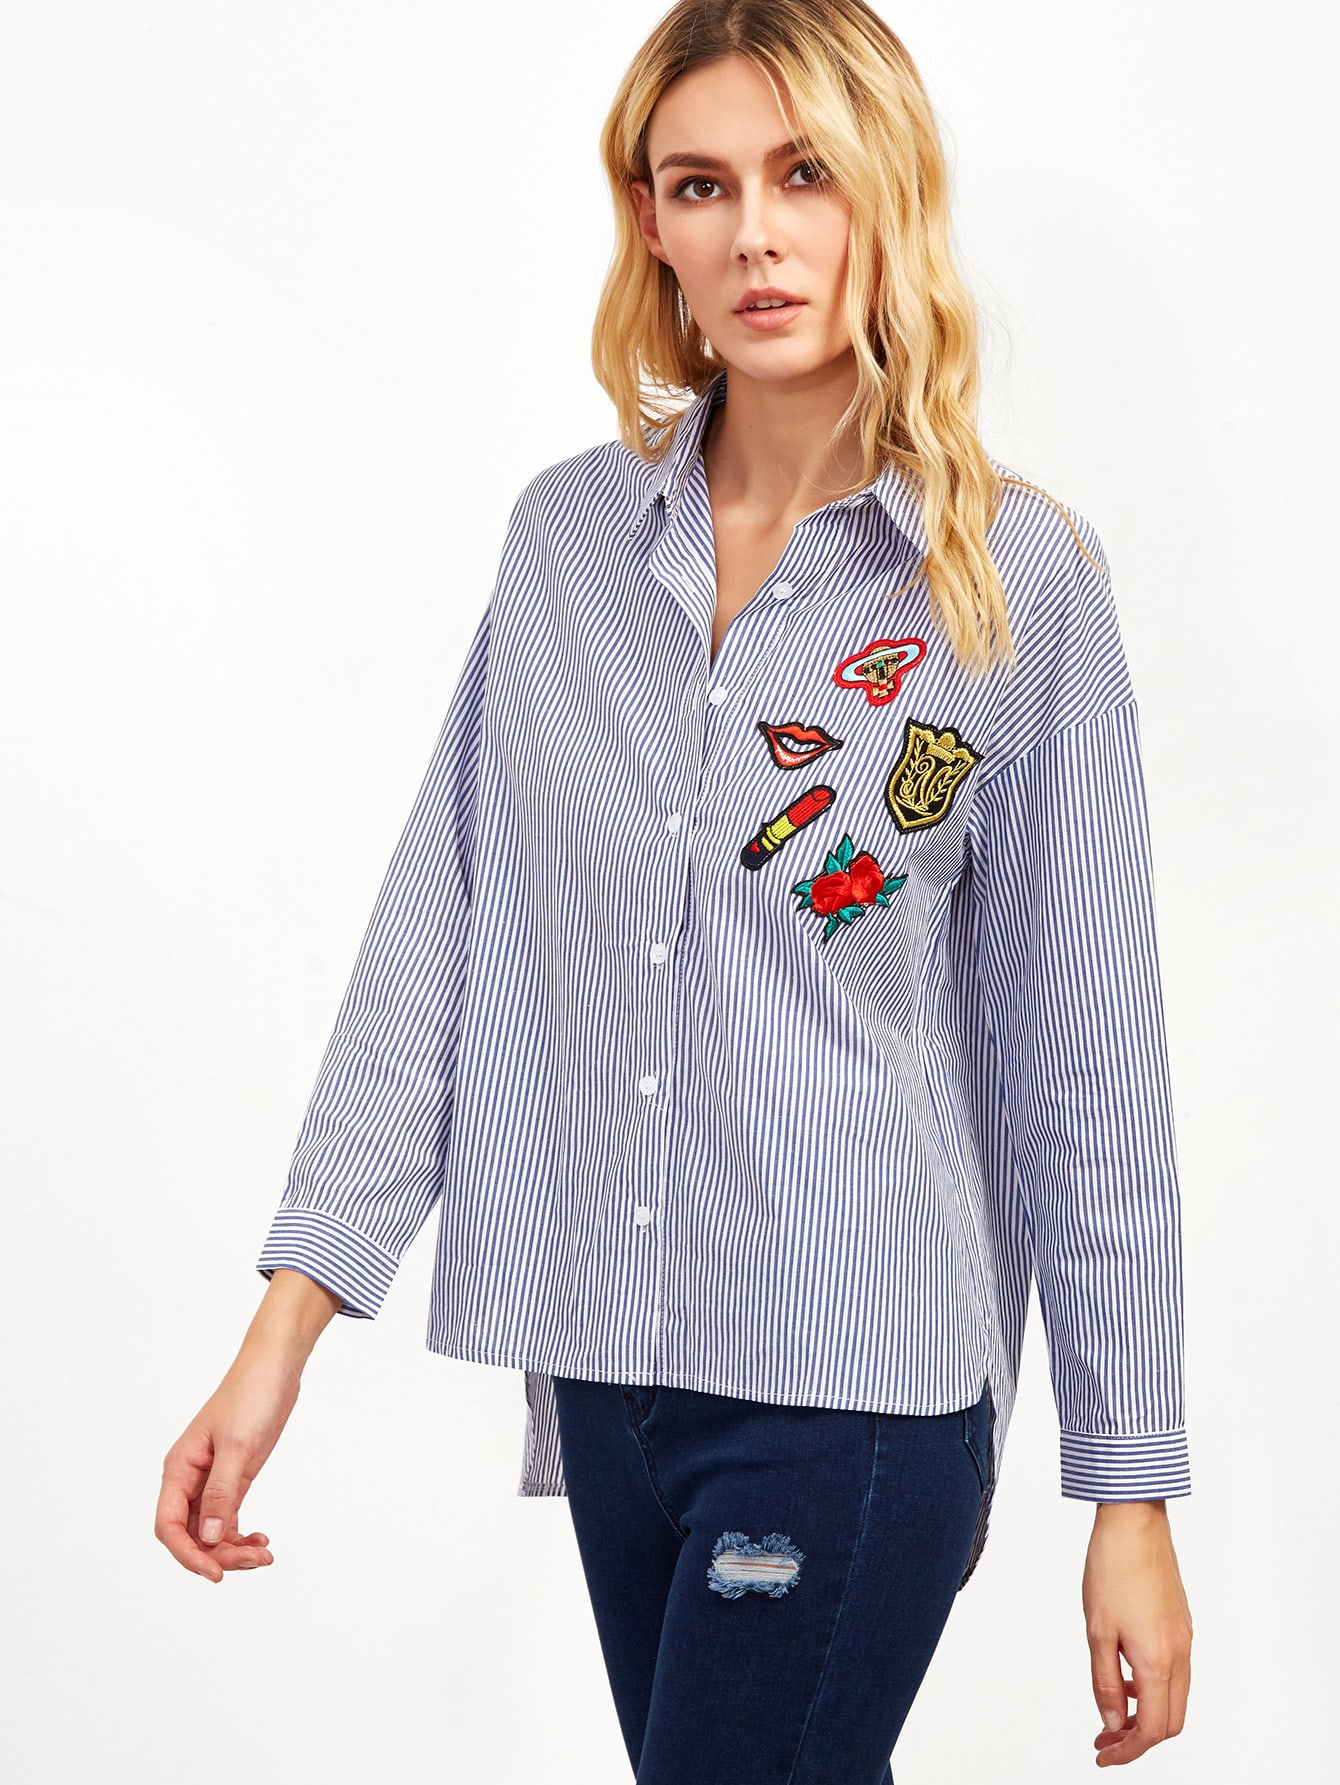 blouse160926402_2